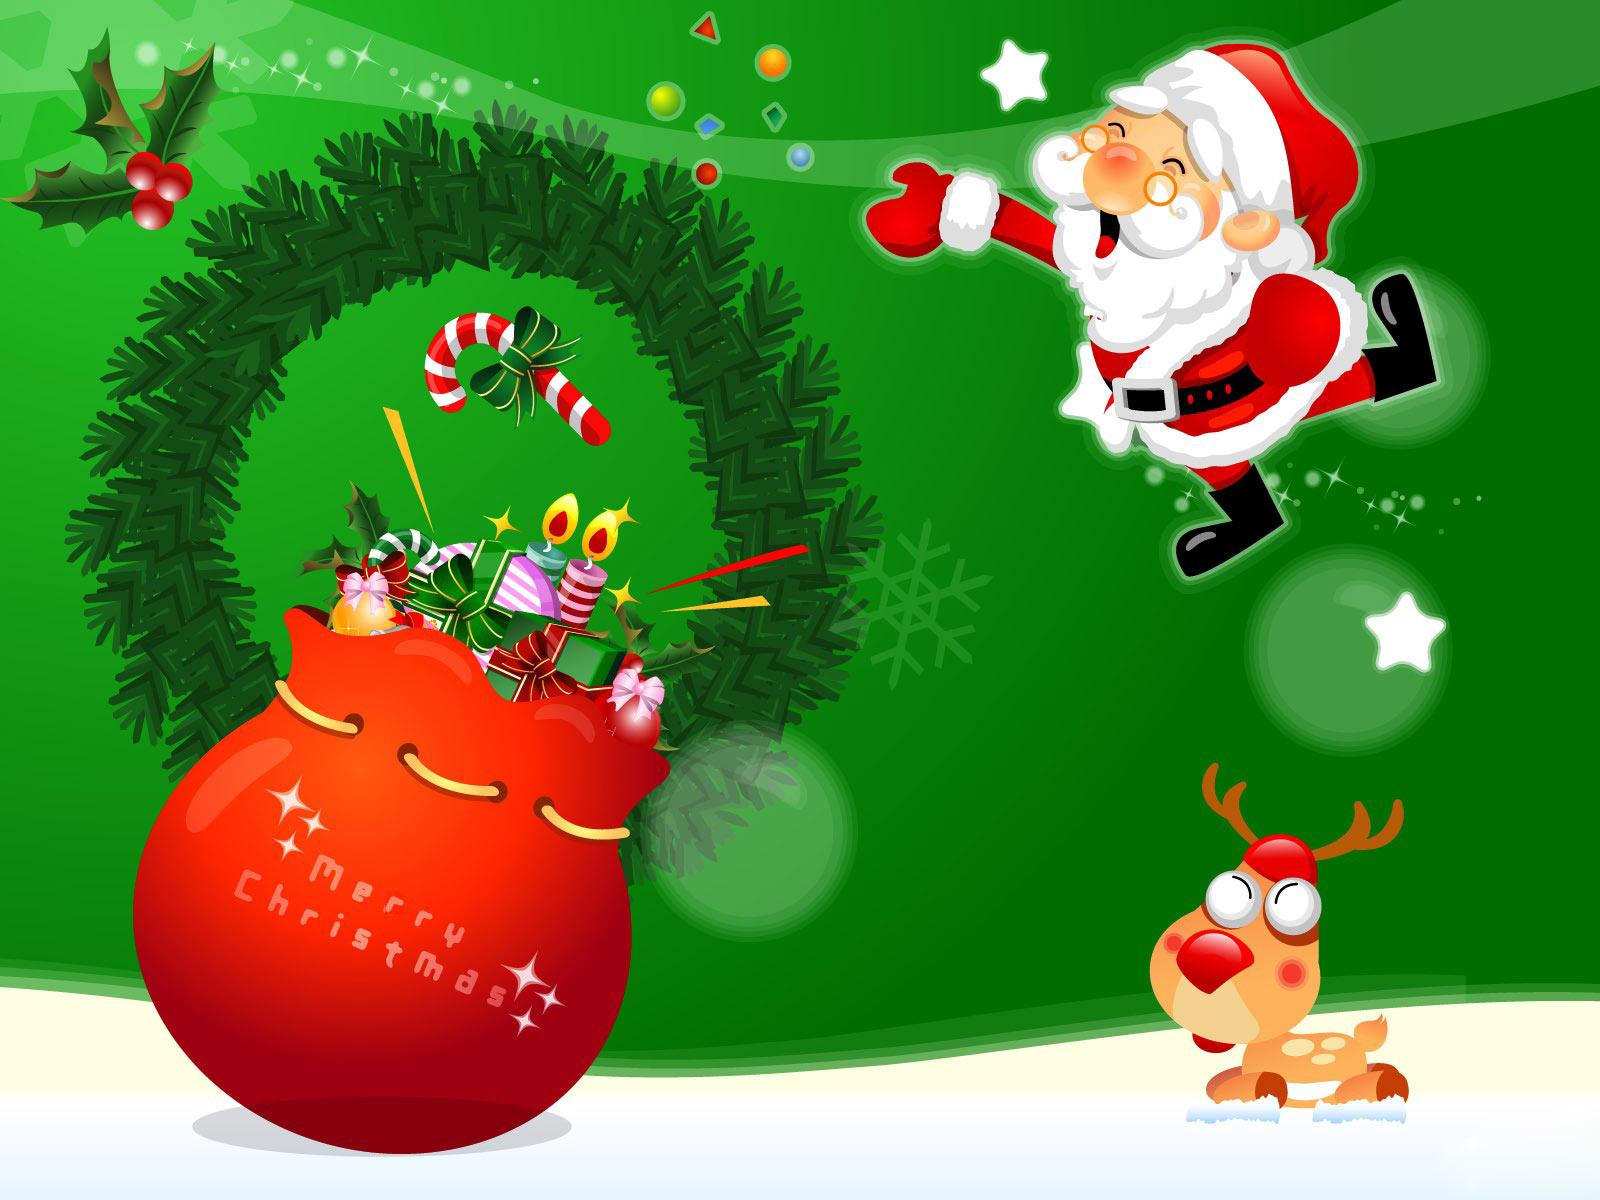 Free Ipad Wallpaper Christmas: Free IPad Wallpaper Christmas